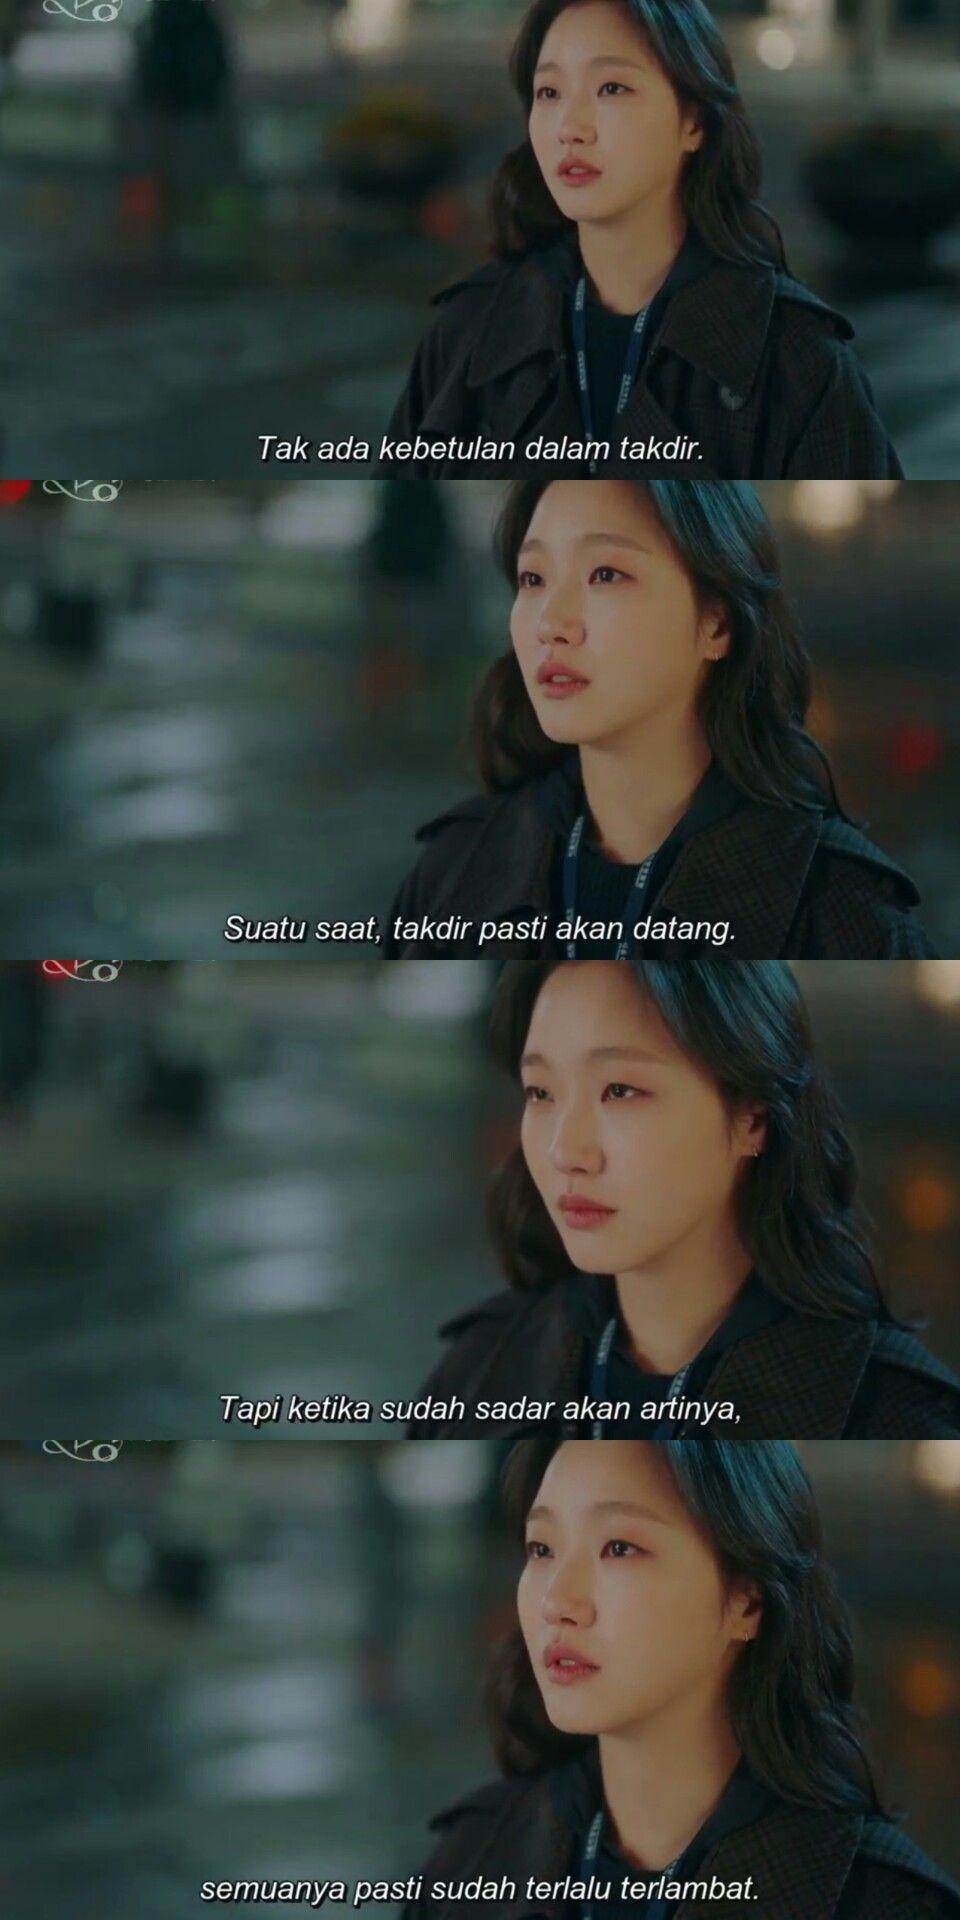 Pin Oleh Adesaania Di Dkorea Kutipan Film Kata Kata Indah Ungkapan Cinta